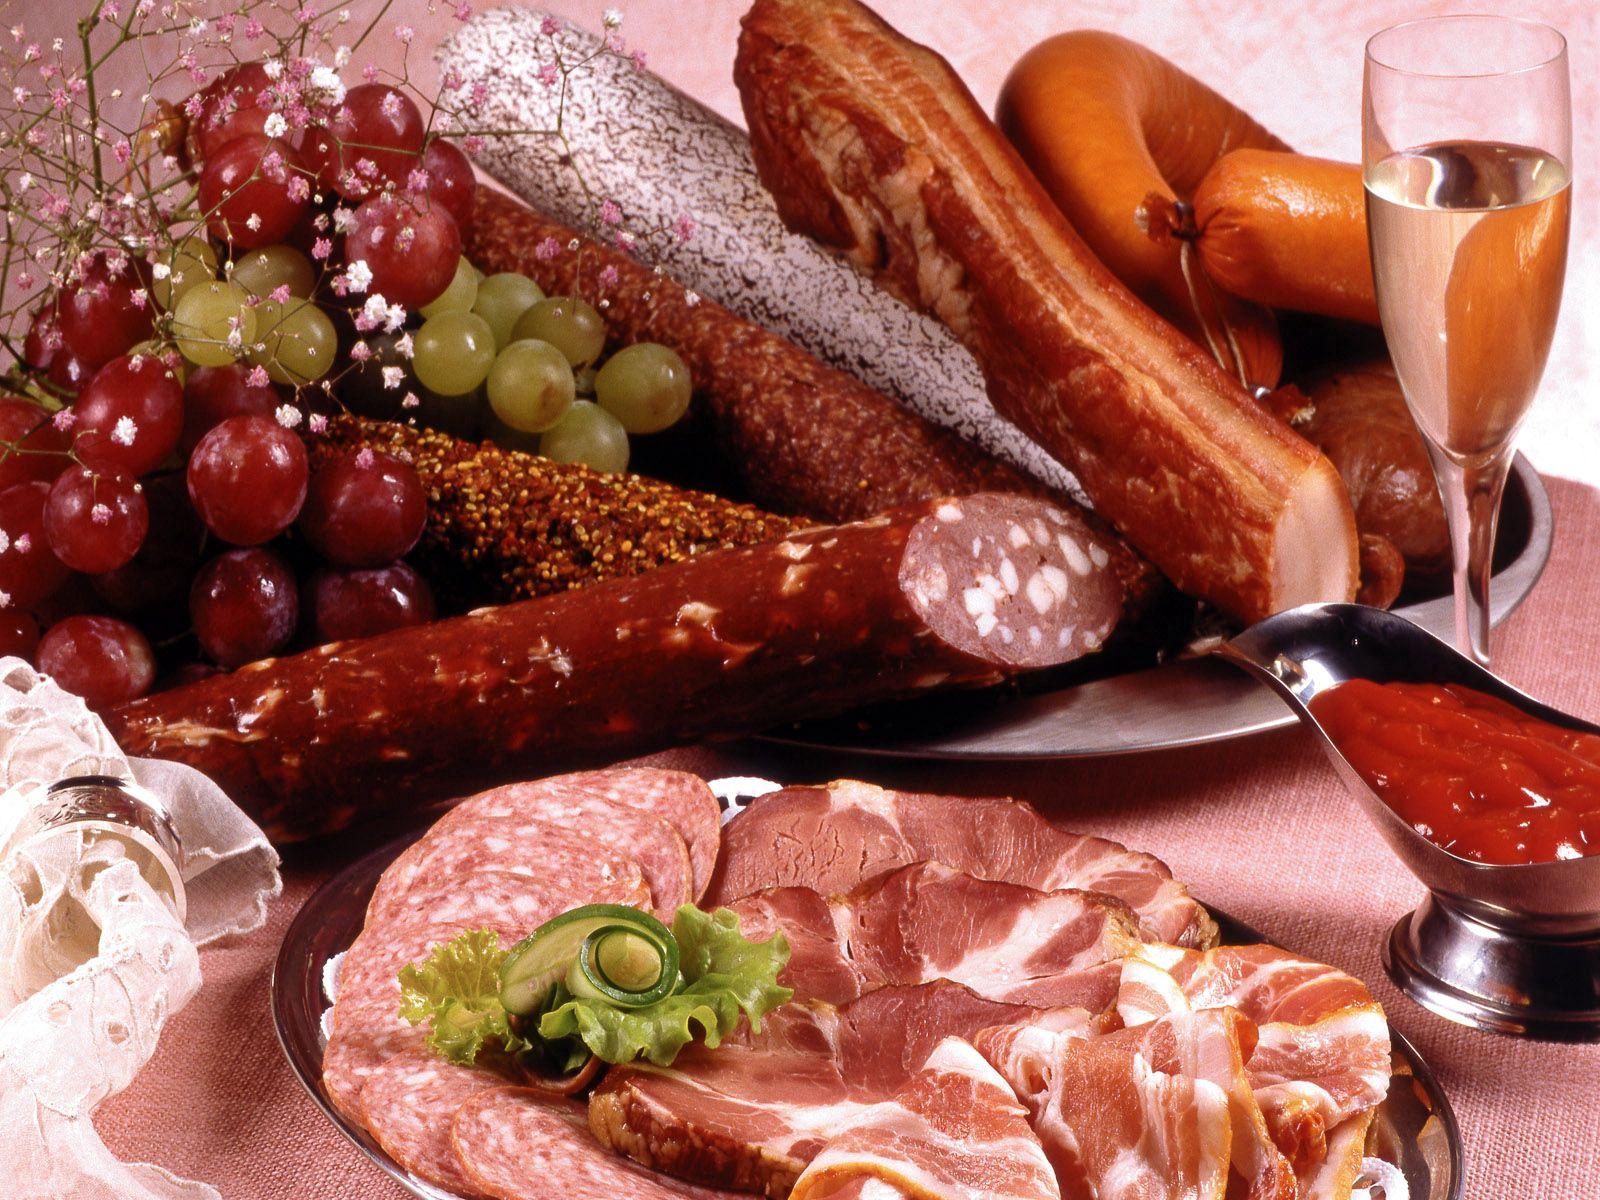 93046 скачать обои Еда, Колбаса, Мясо, Нарезка, Вино, Соус, Виноград - заставки и картинки бесплатно